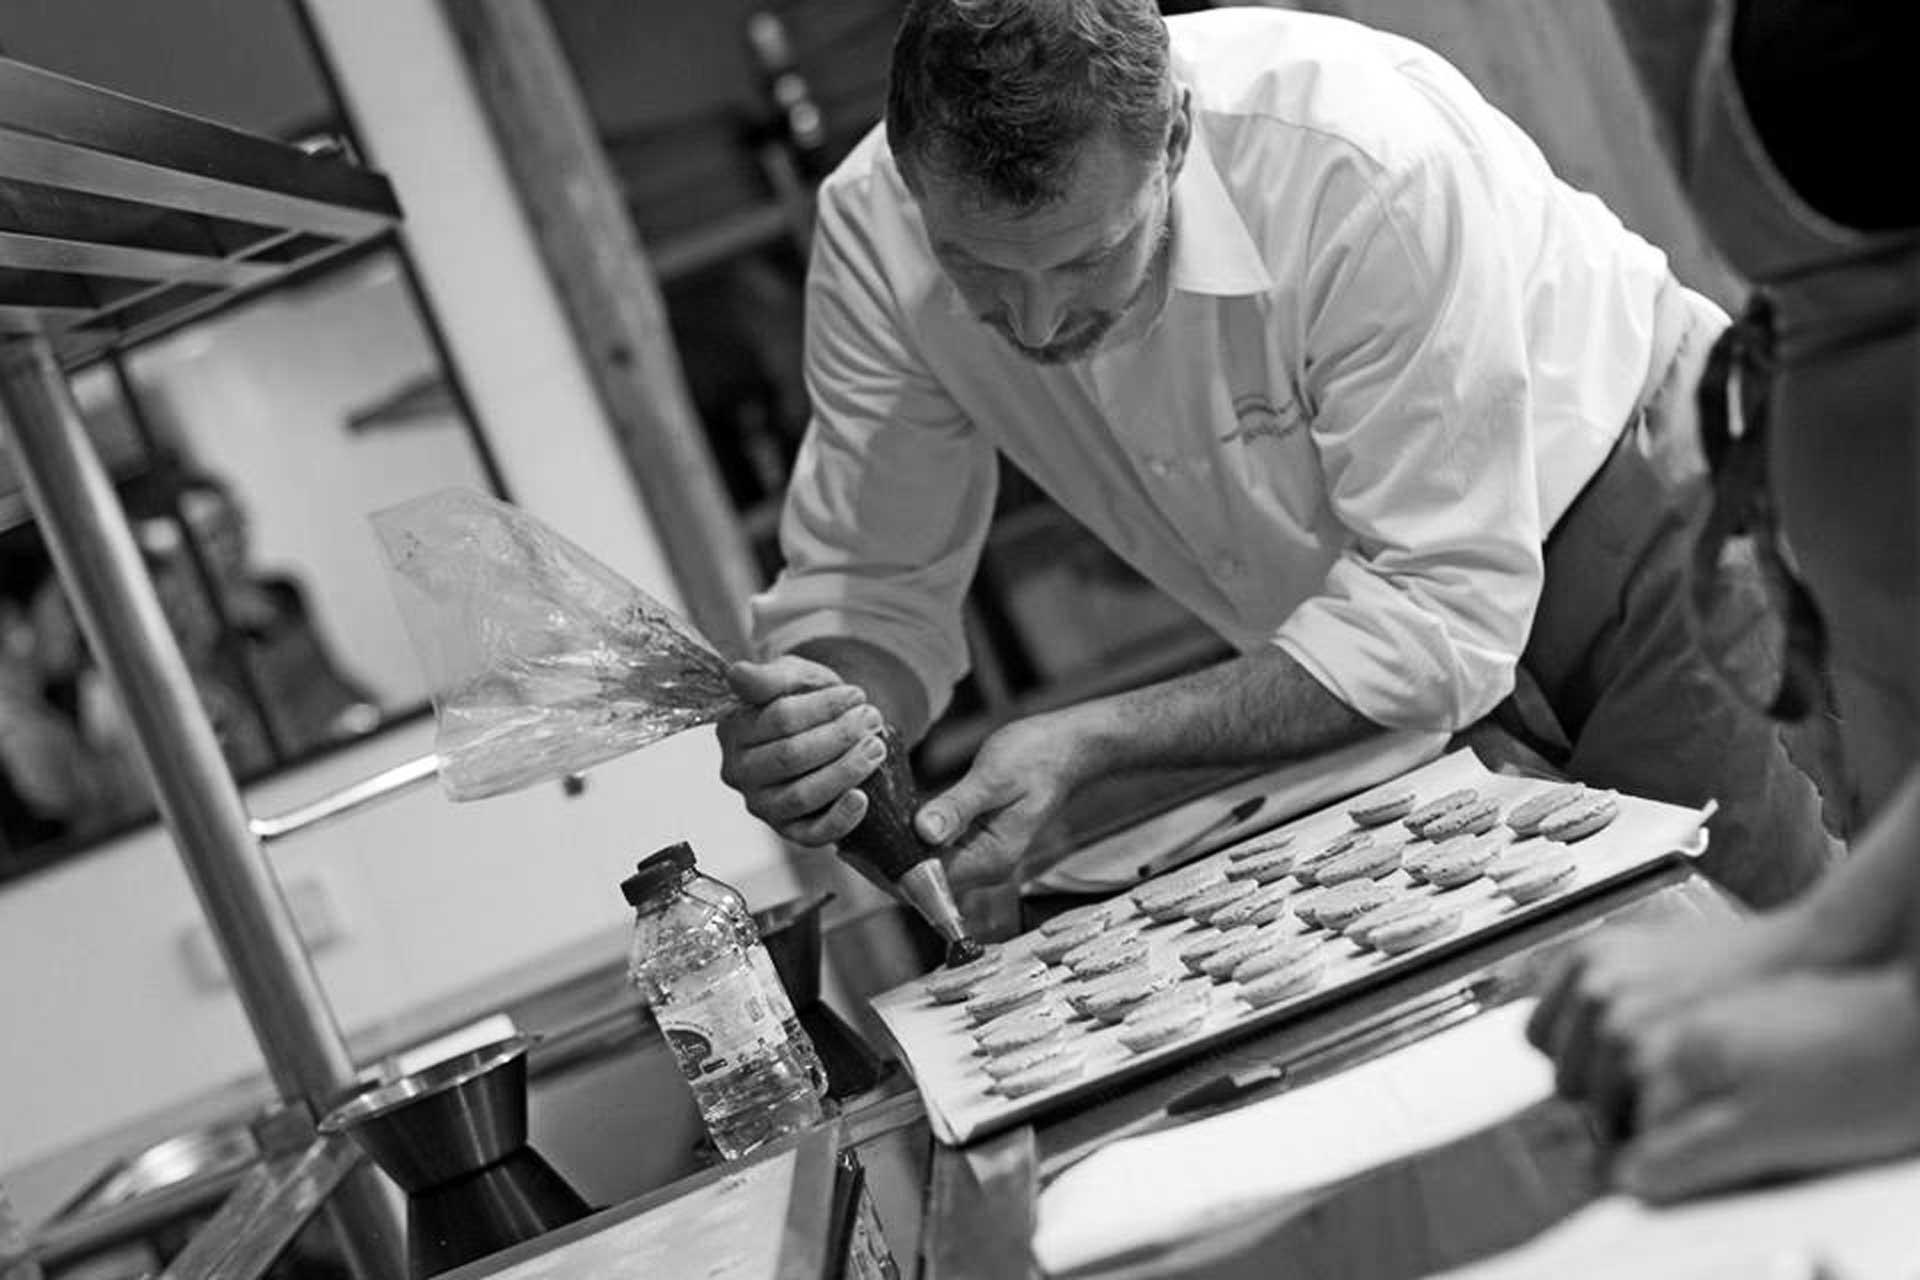 photo-bon-cadeau-nicolas-denis-chef-patissier-macaron-magnanerie-seillans-provence-var